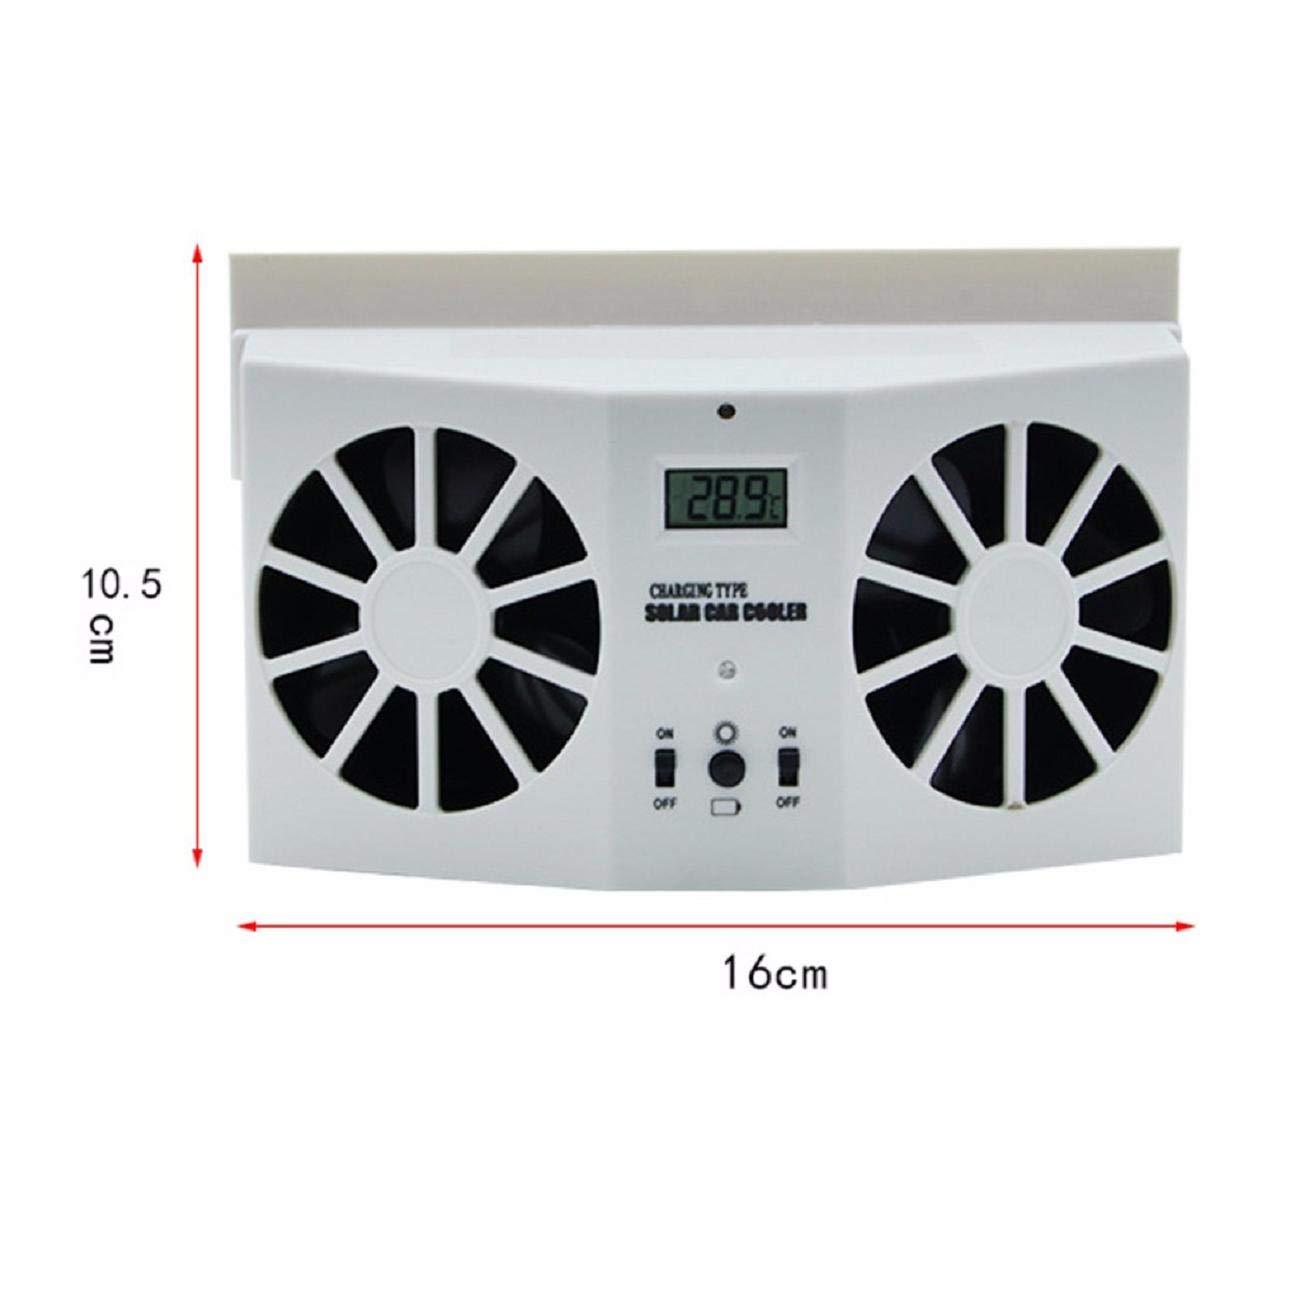 GreatFun Durable Solar Powered Auto Car Window Air Vent Ventilator Mini Air Conditioner Cool Fan Eliminate The Peculiar Smell Inside The Car